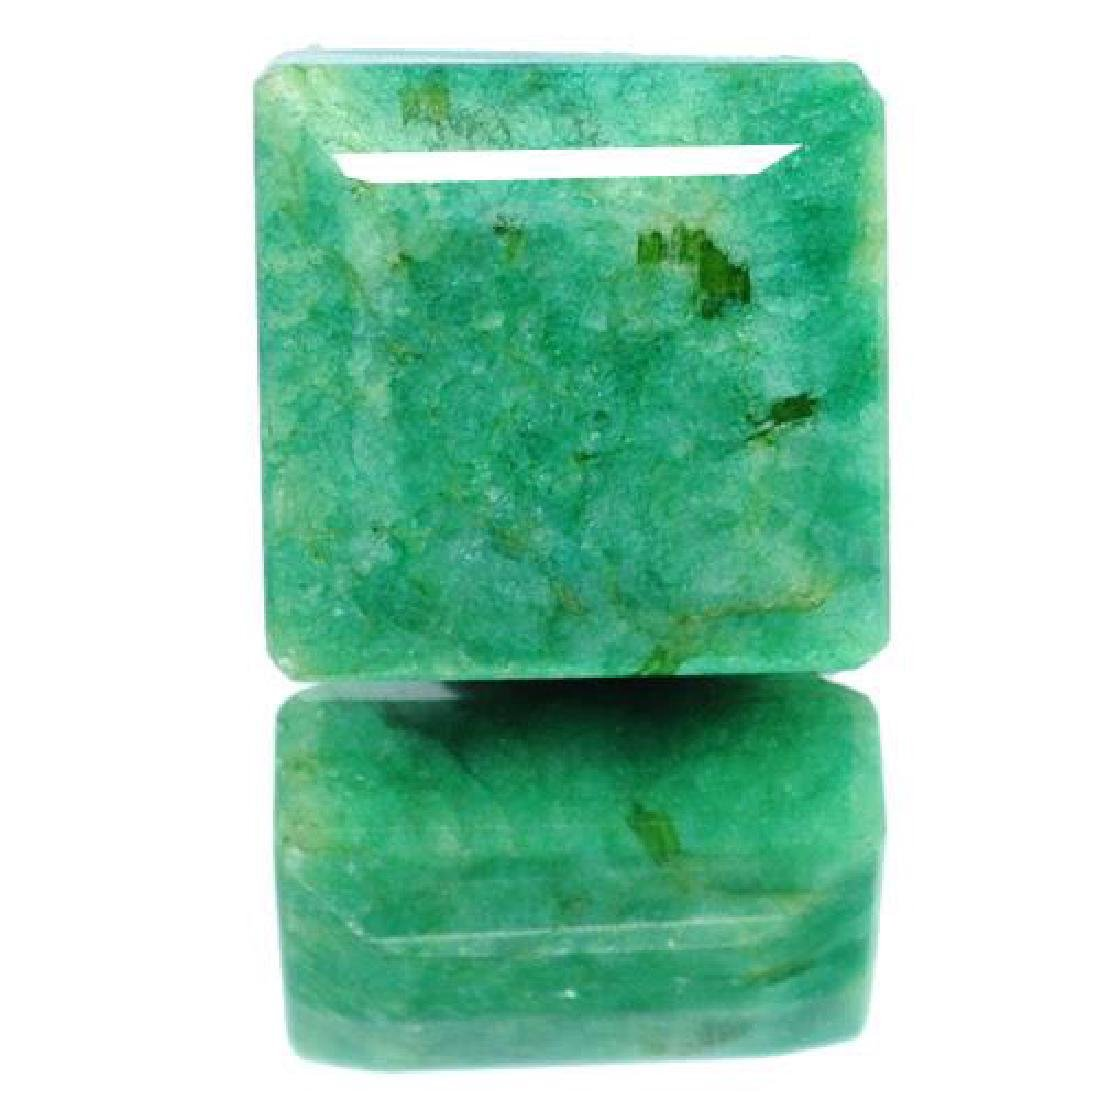 128.00 Carat Loose Emerald, KGCL Cert